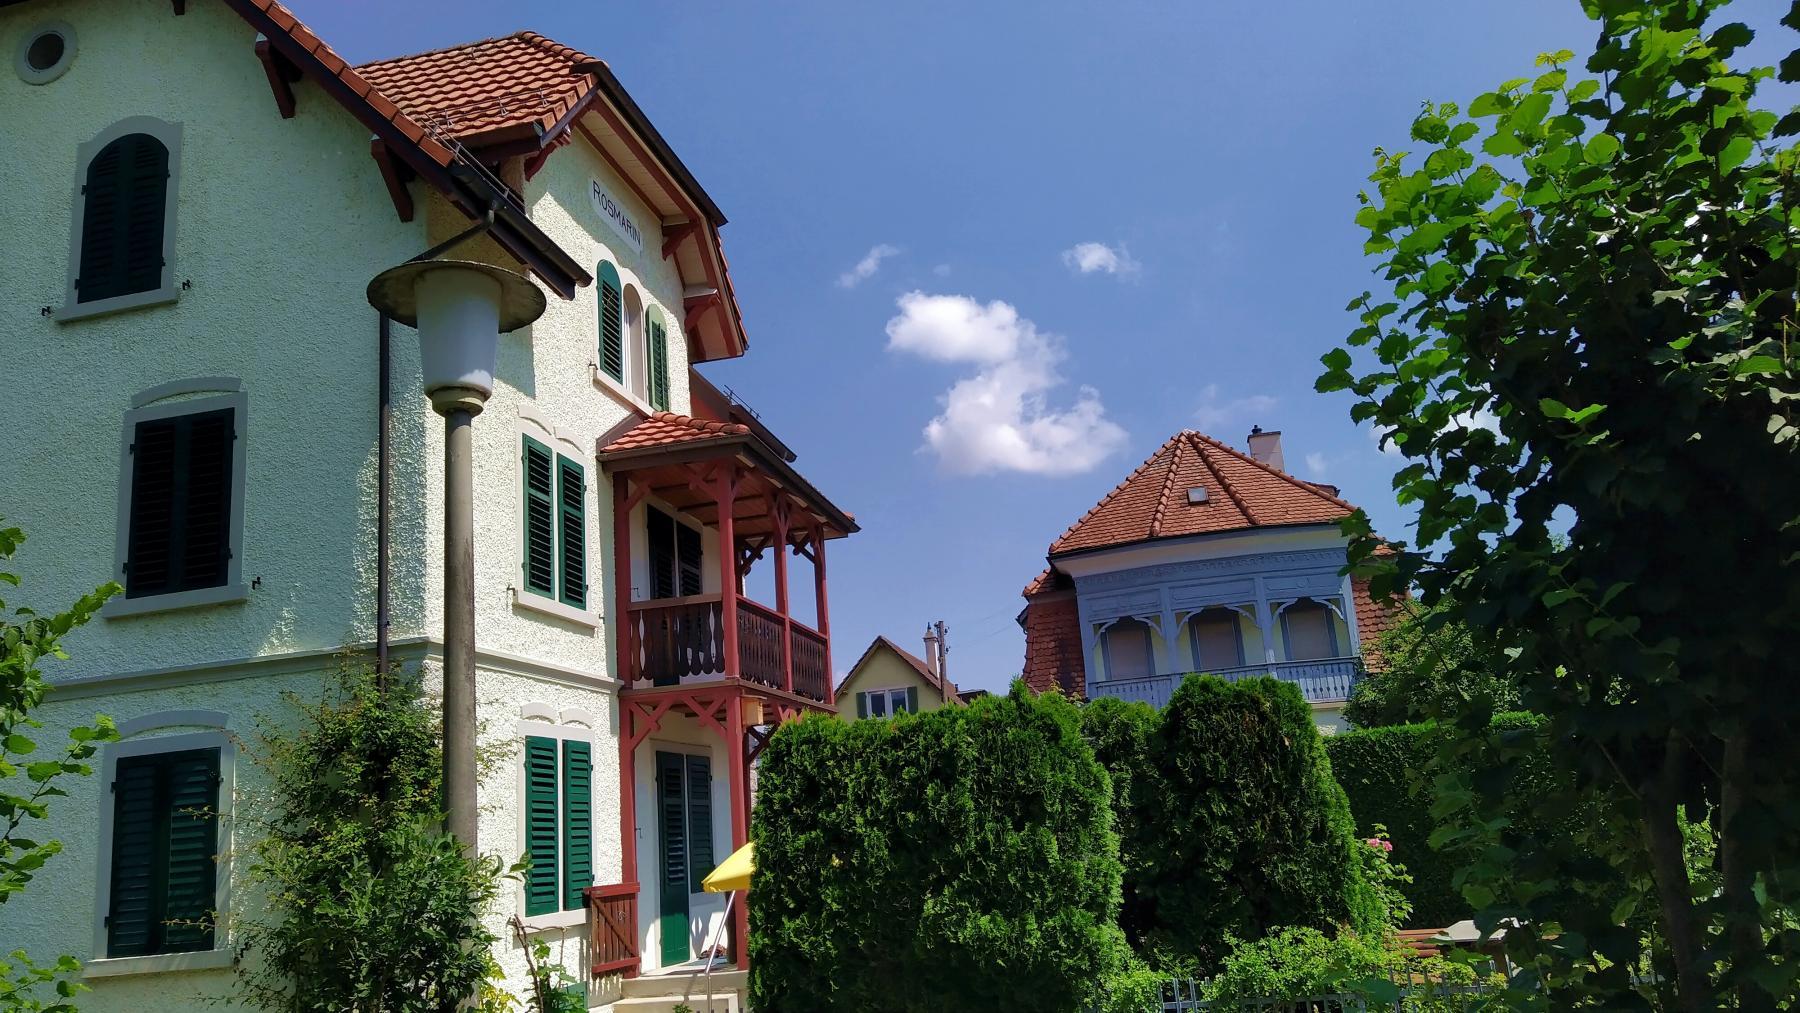 11 Villen «rumänischer Stil»